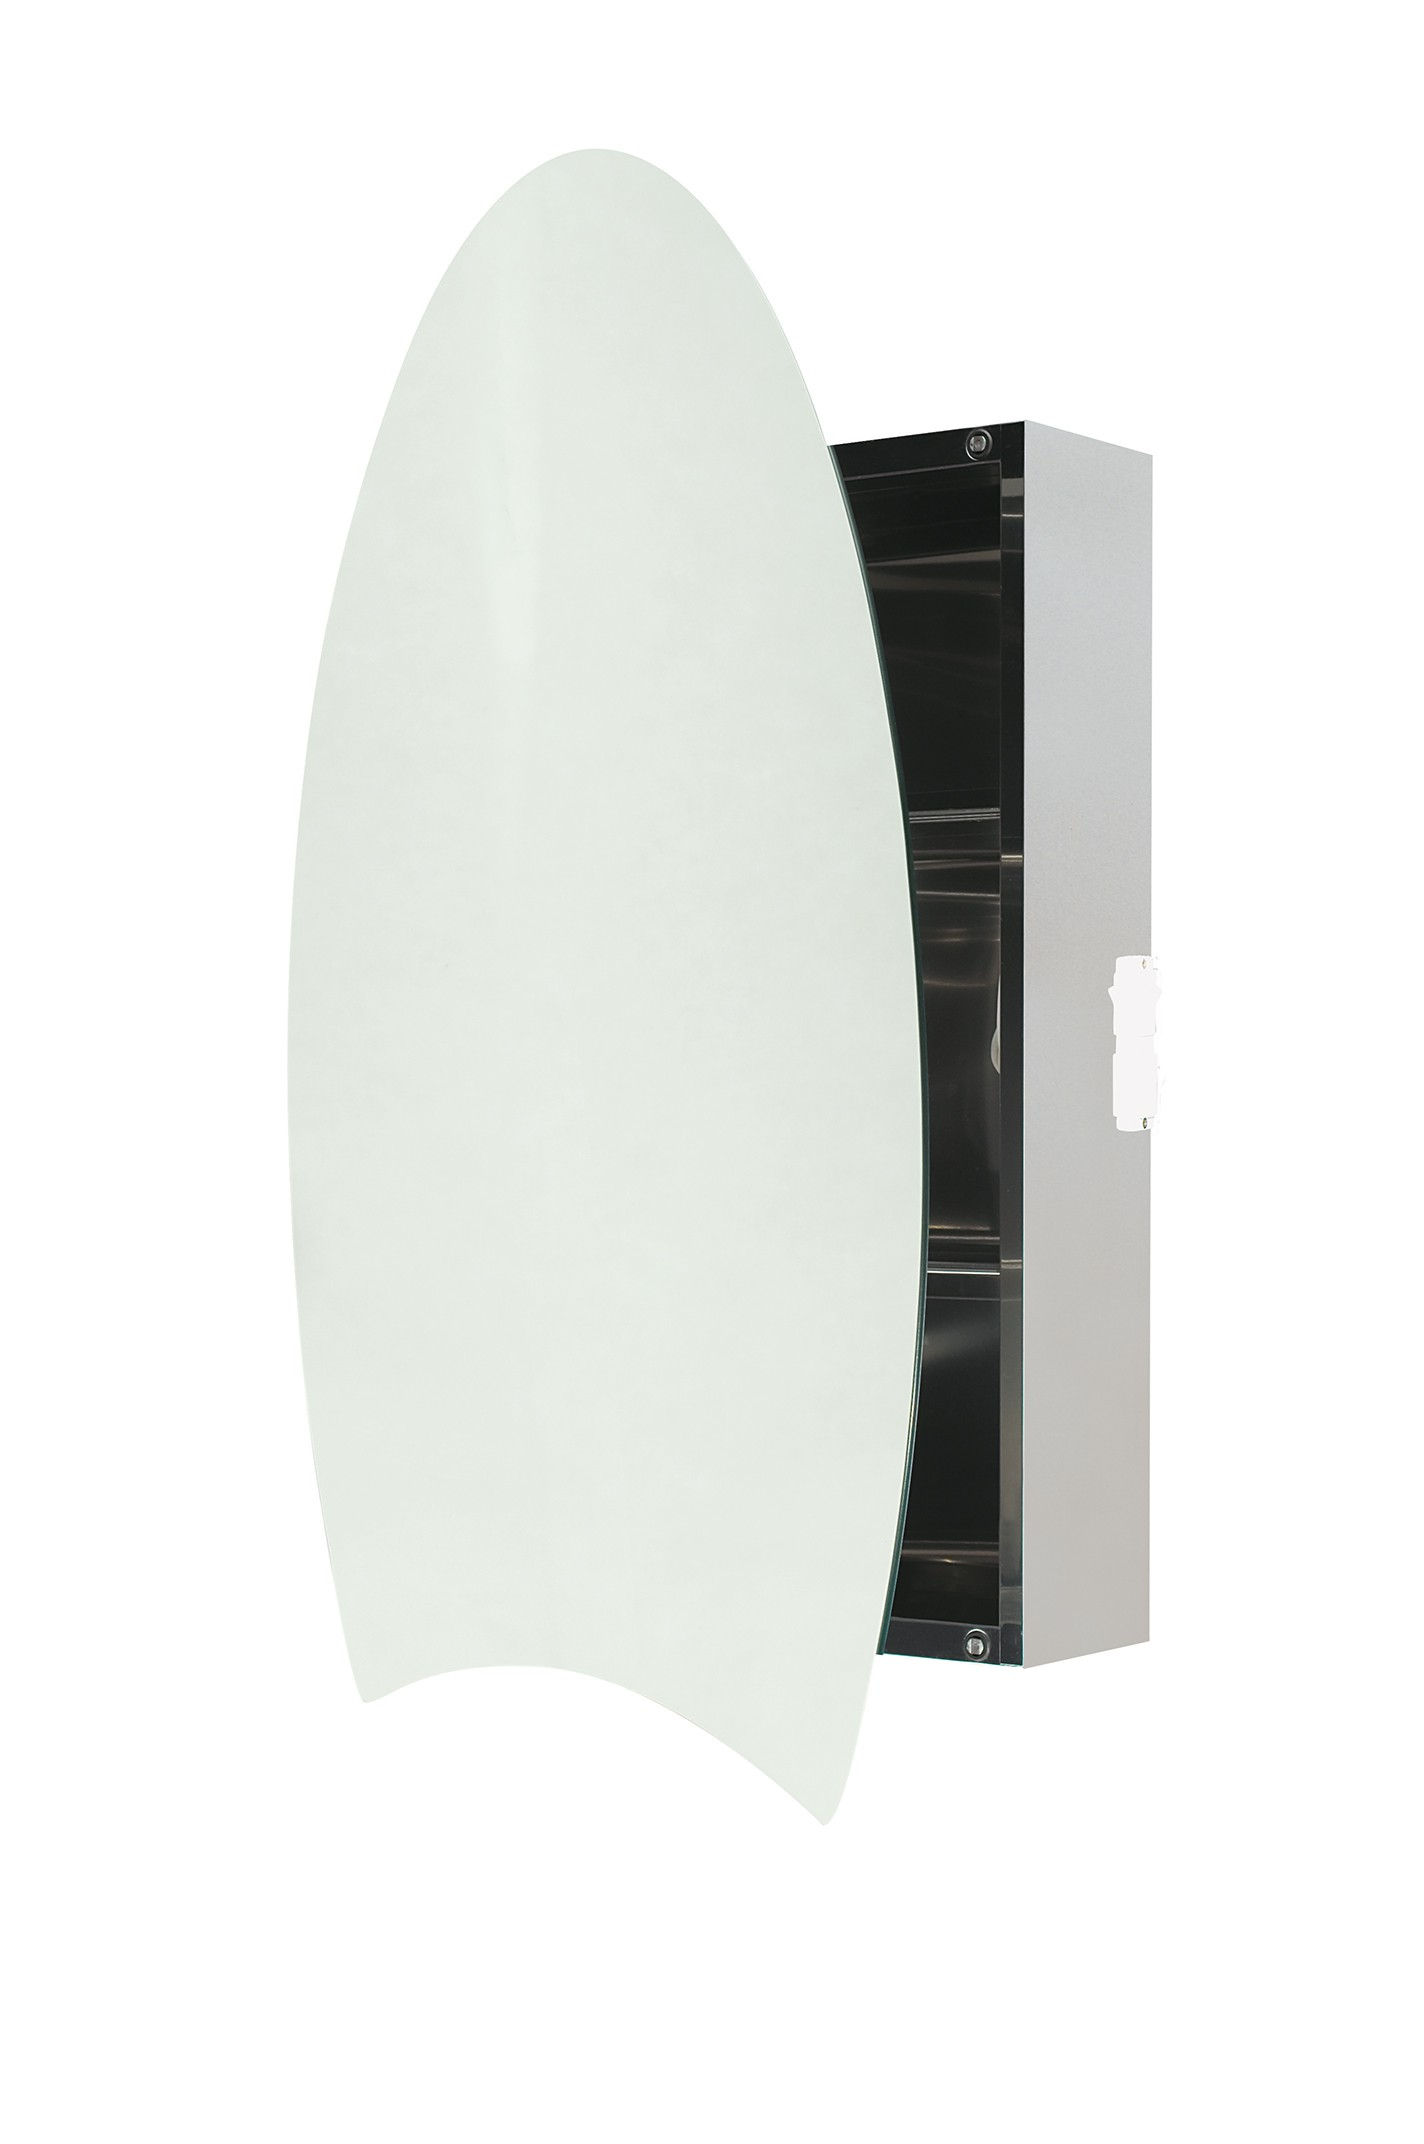 Stilhaus arredo bagno   accessori da bagno   edilceramiche di maccanò